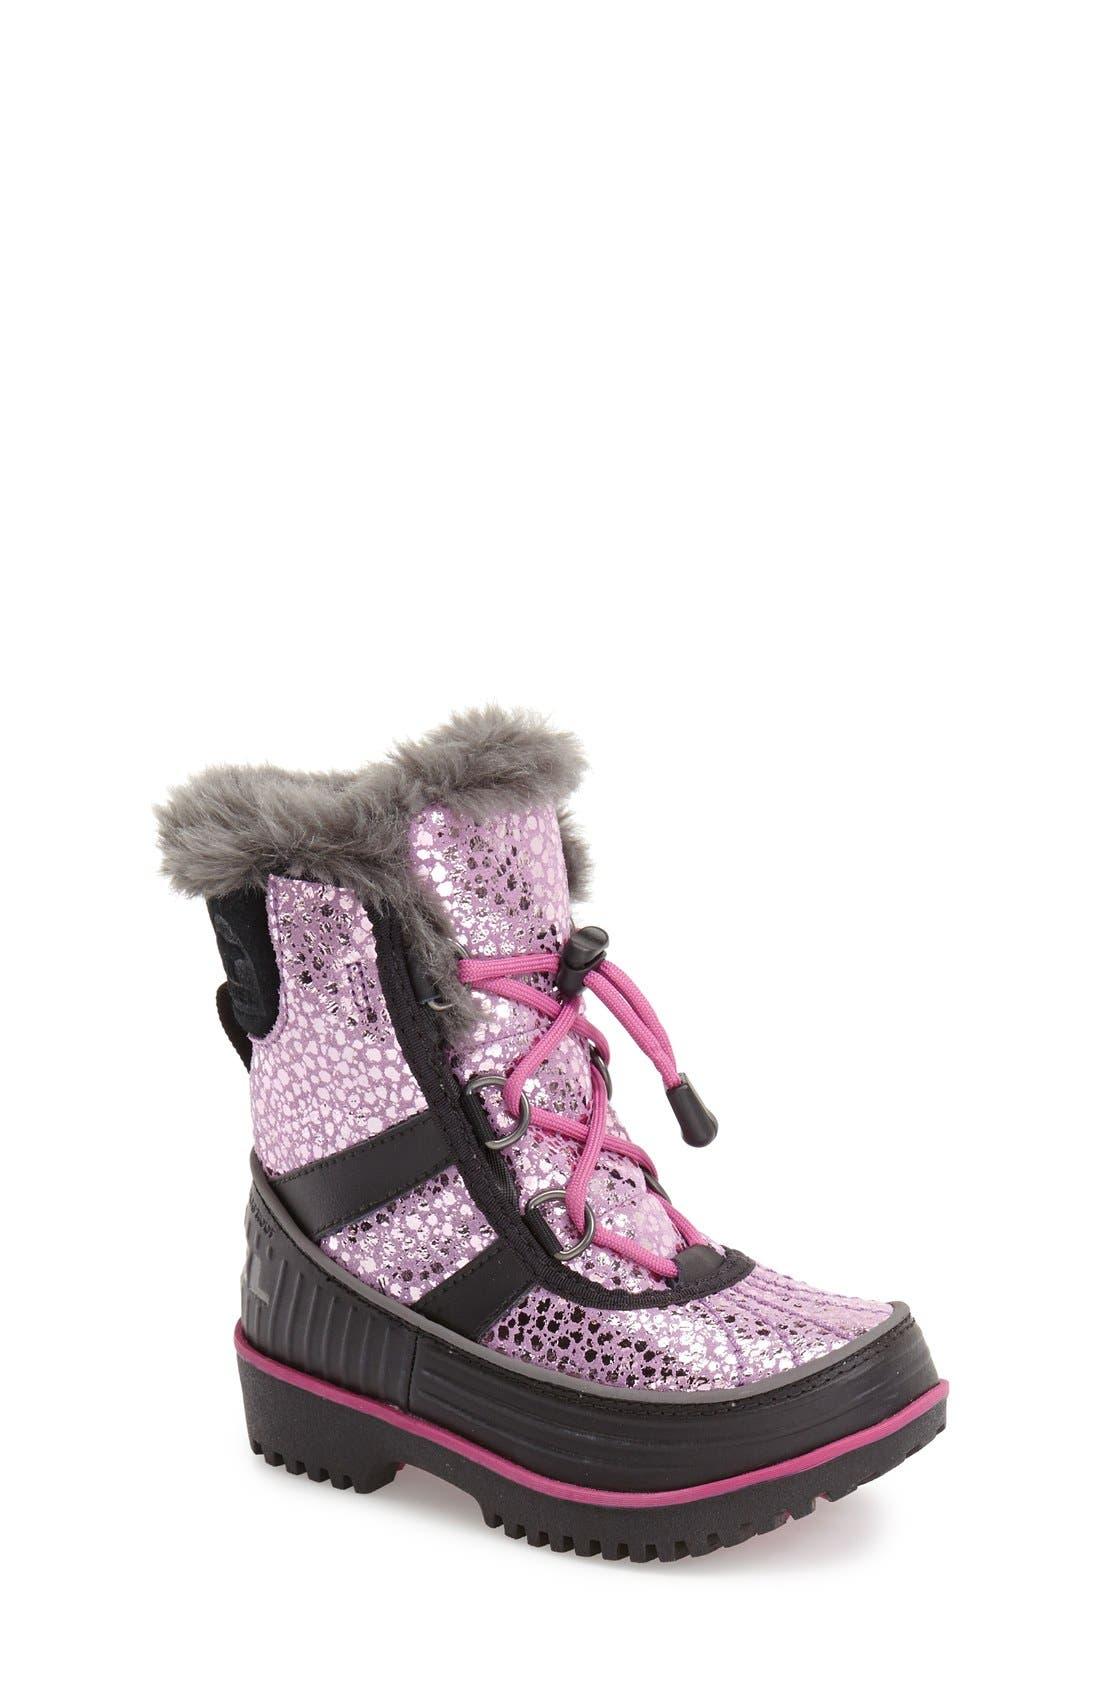 Alternate Image 1 Selected - SOREL 'Tivoli II' Waterproof Snow Boot (Toddler & Little Kid)